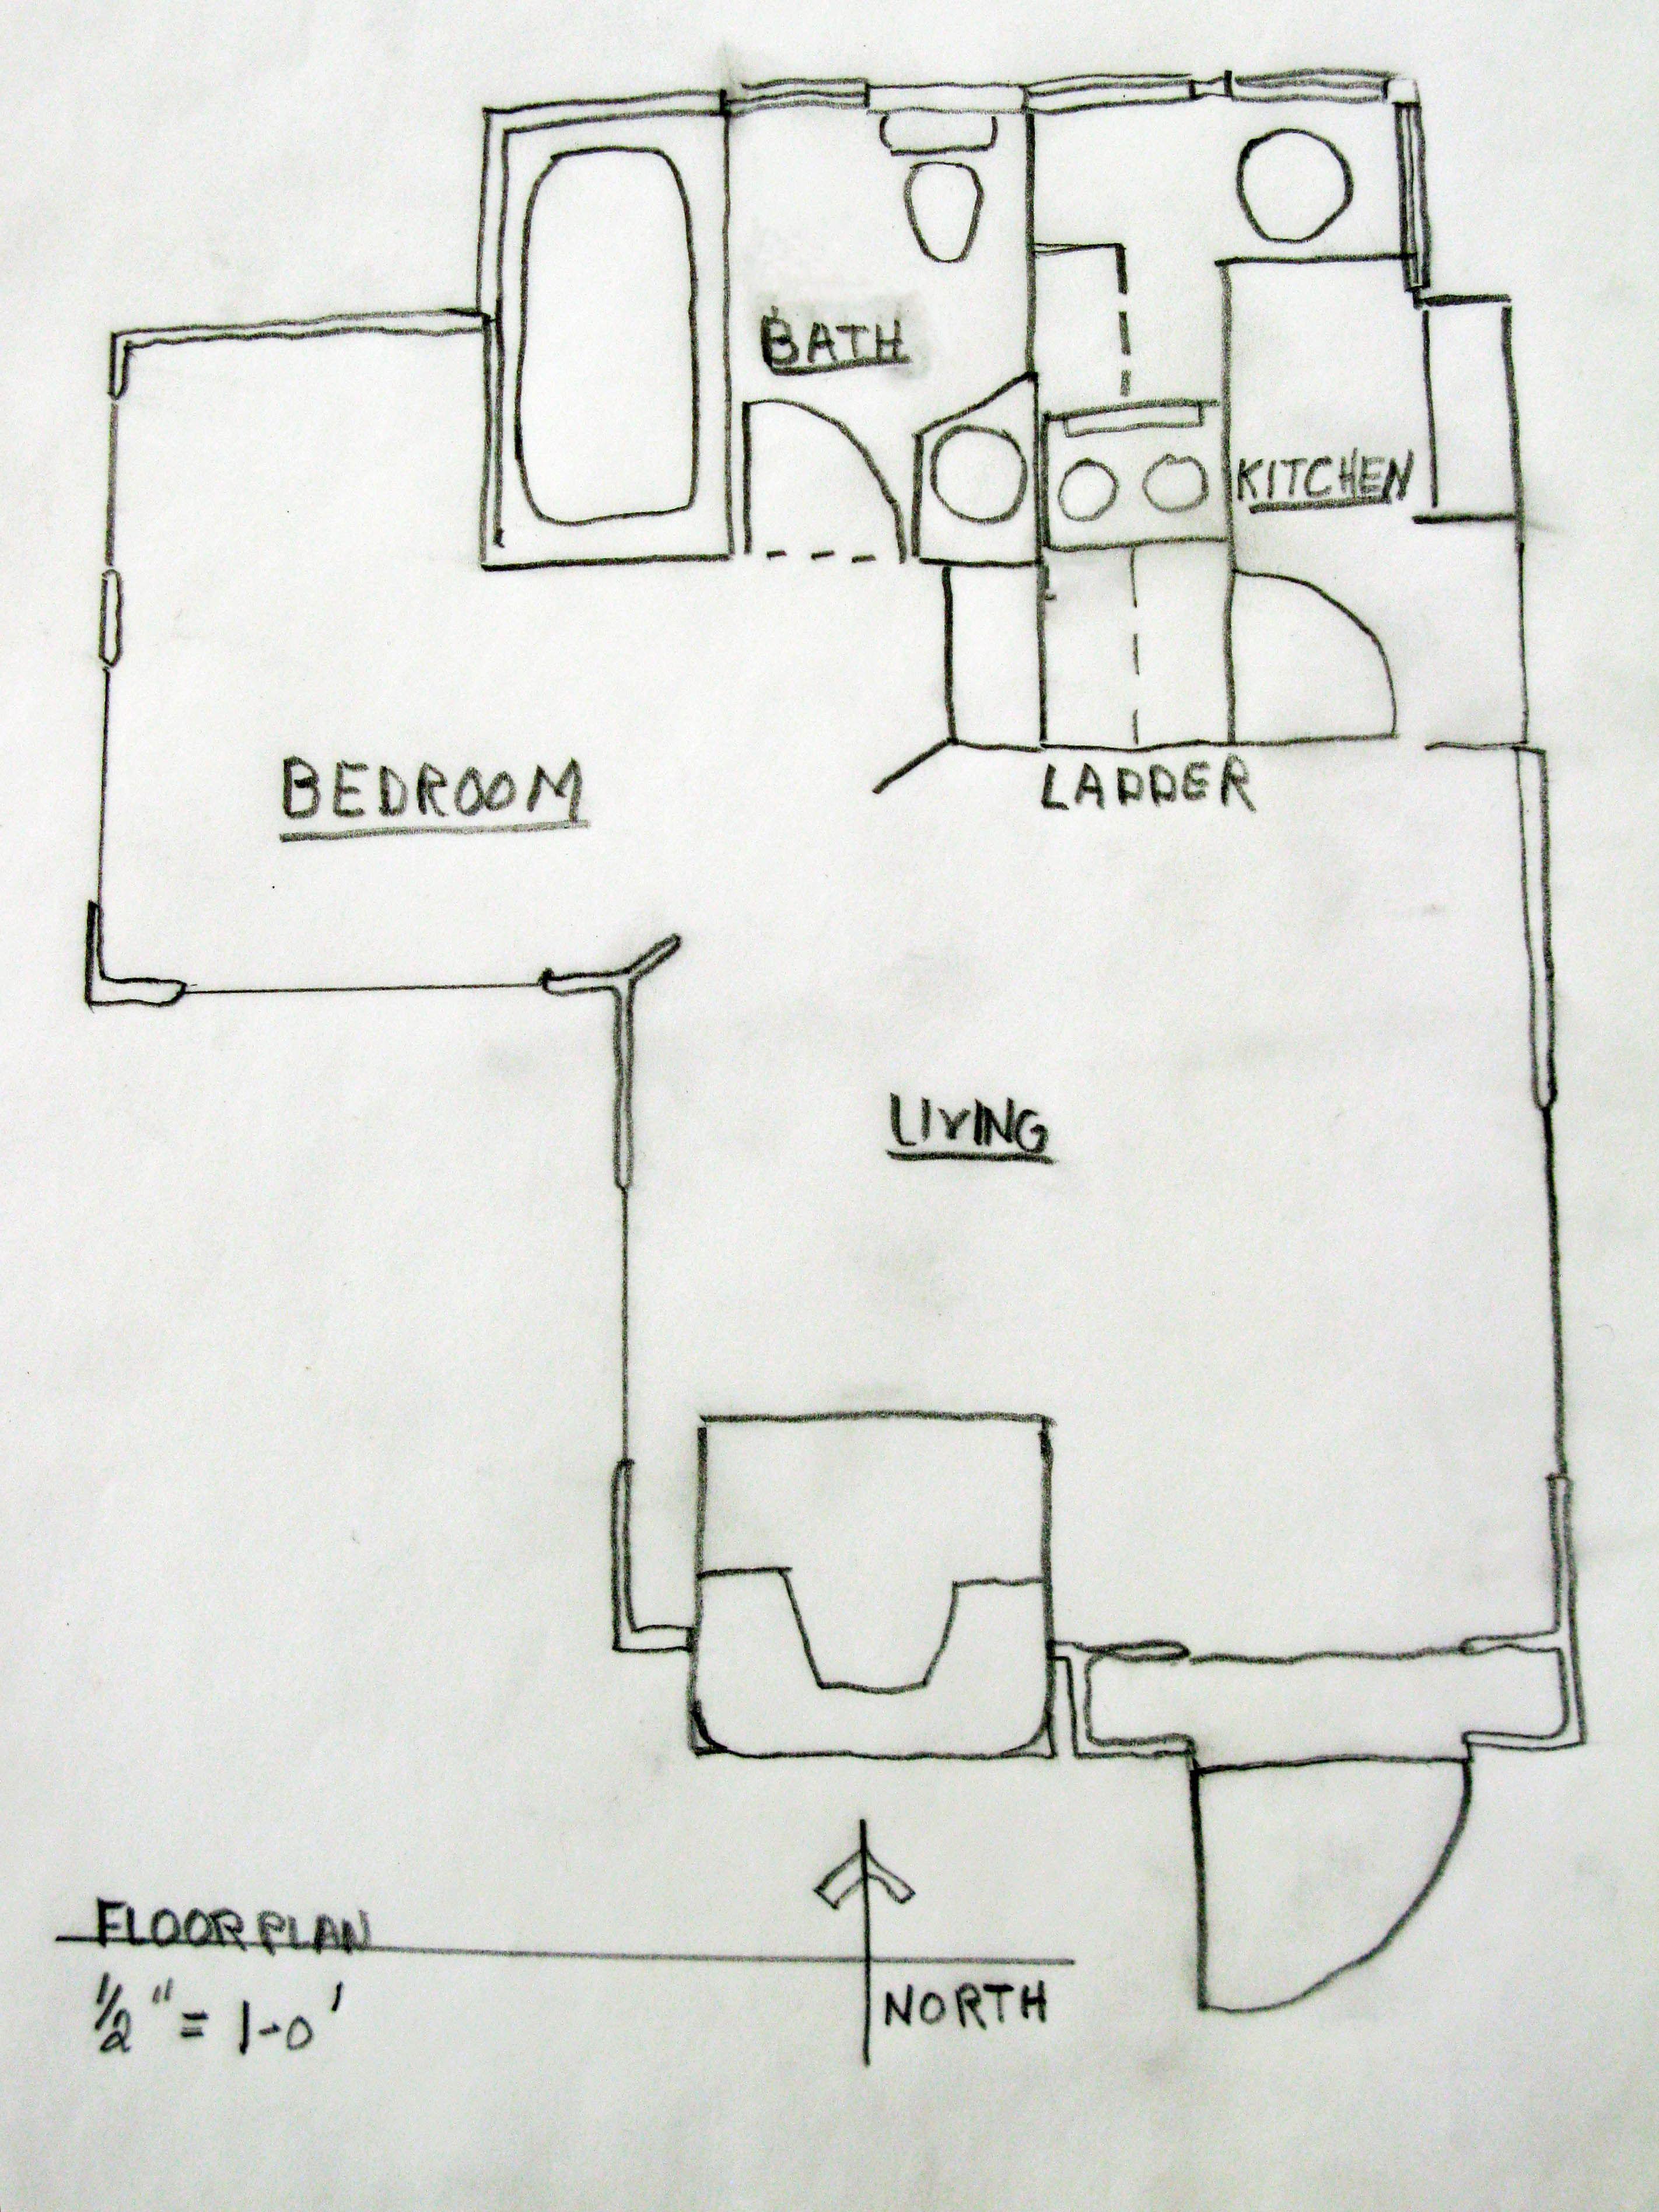 Hugh Comstocks Hansel cottage in Carmel – Carmel Cottage House Plans